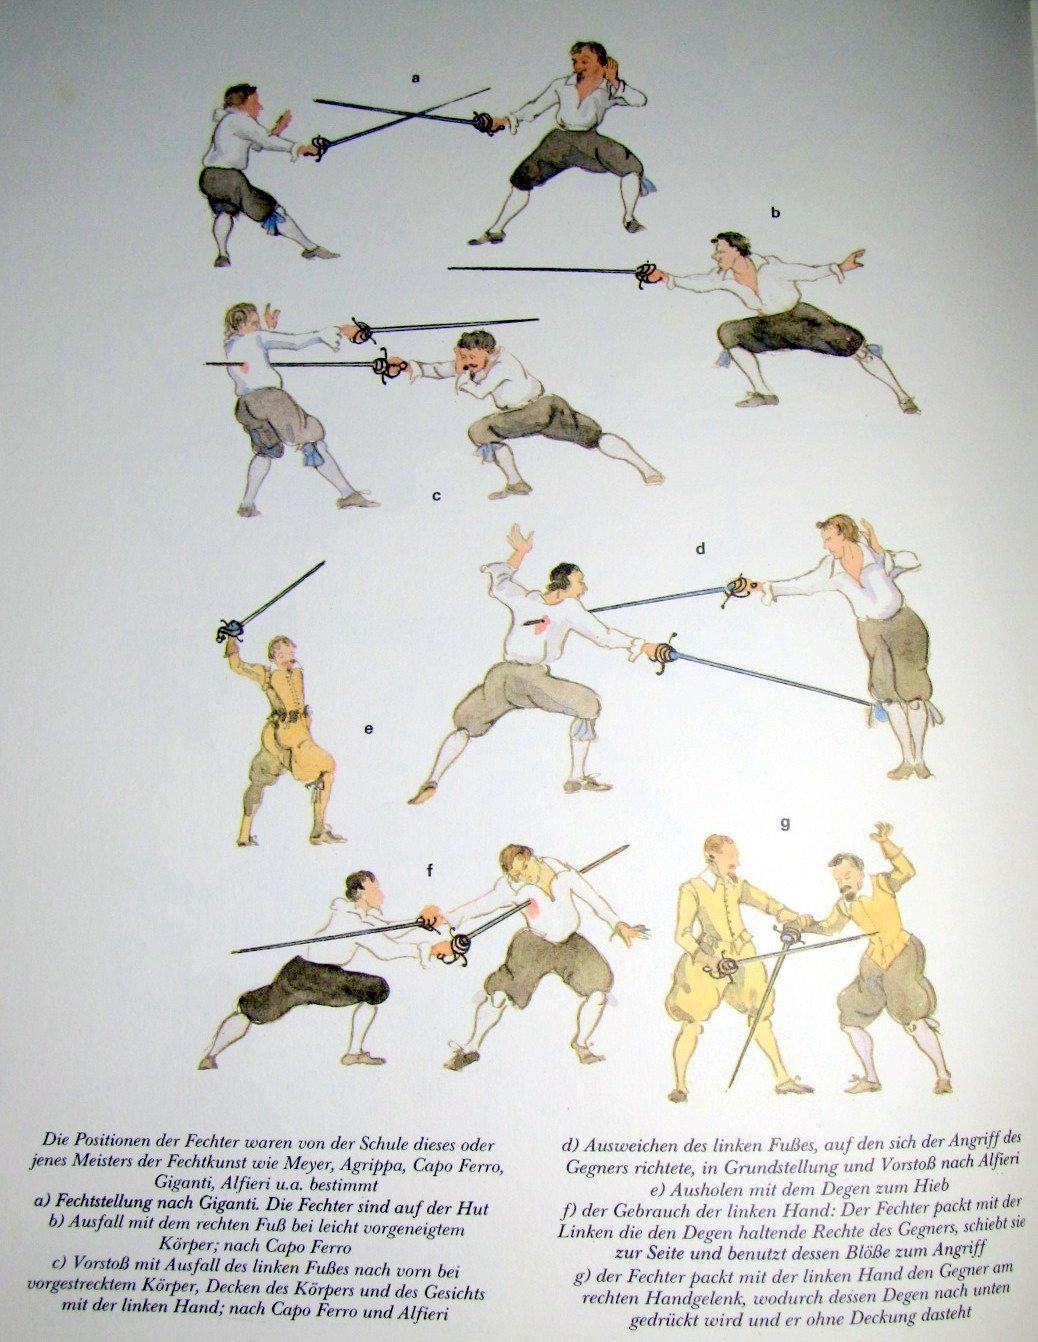 An Essay on the Evolution of Warfare